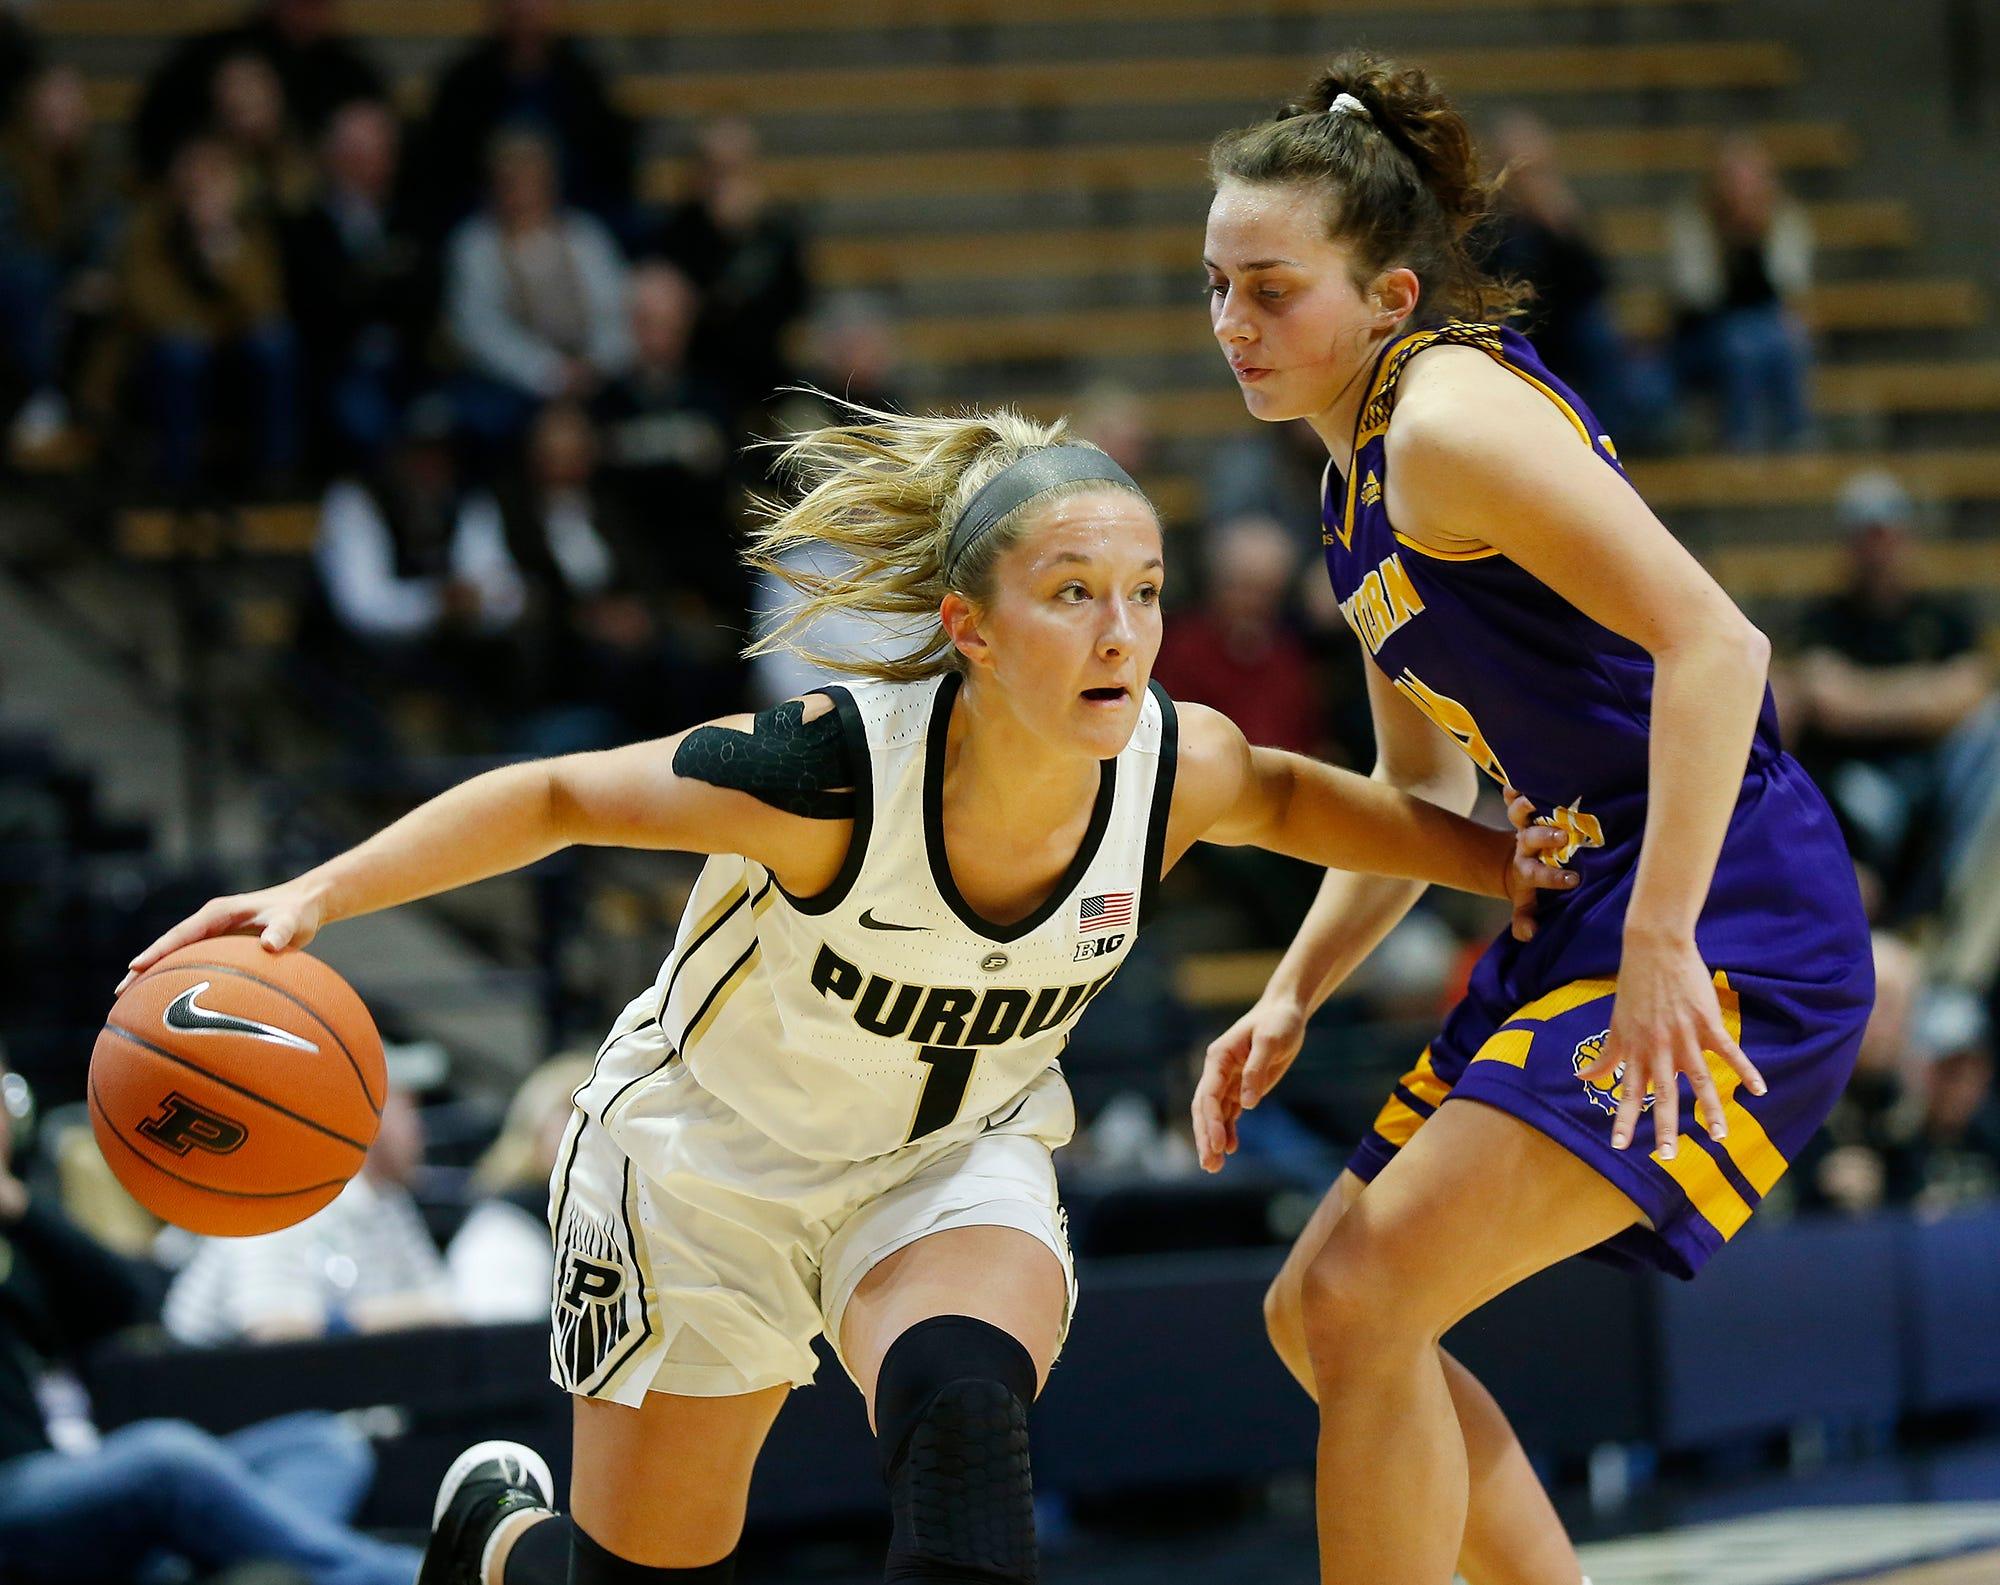 Purdue guard Karissa McLaughlin gets a step on Elizabeth Lutz of Western Illinois.